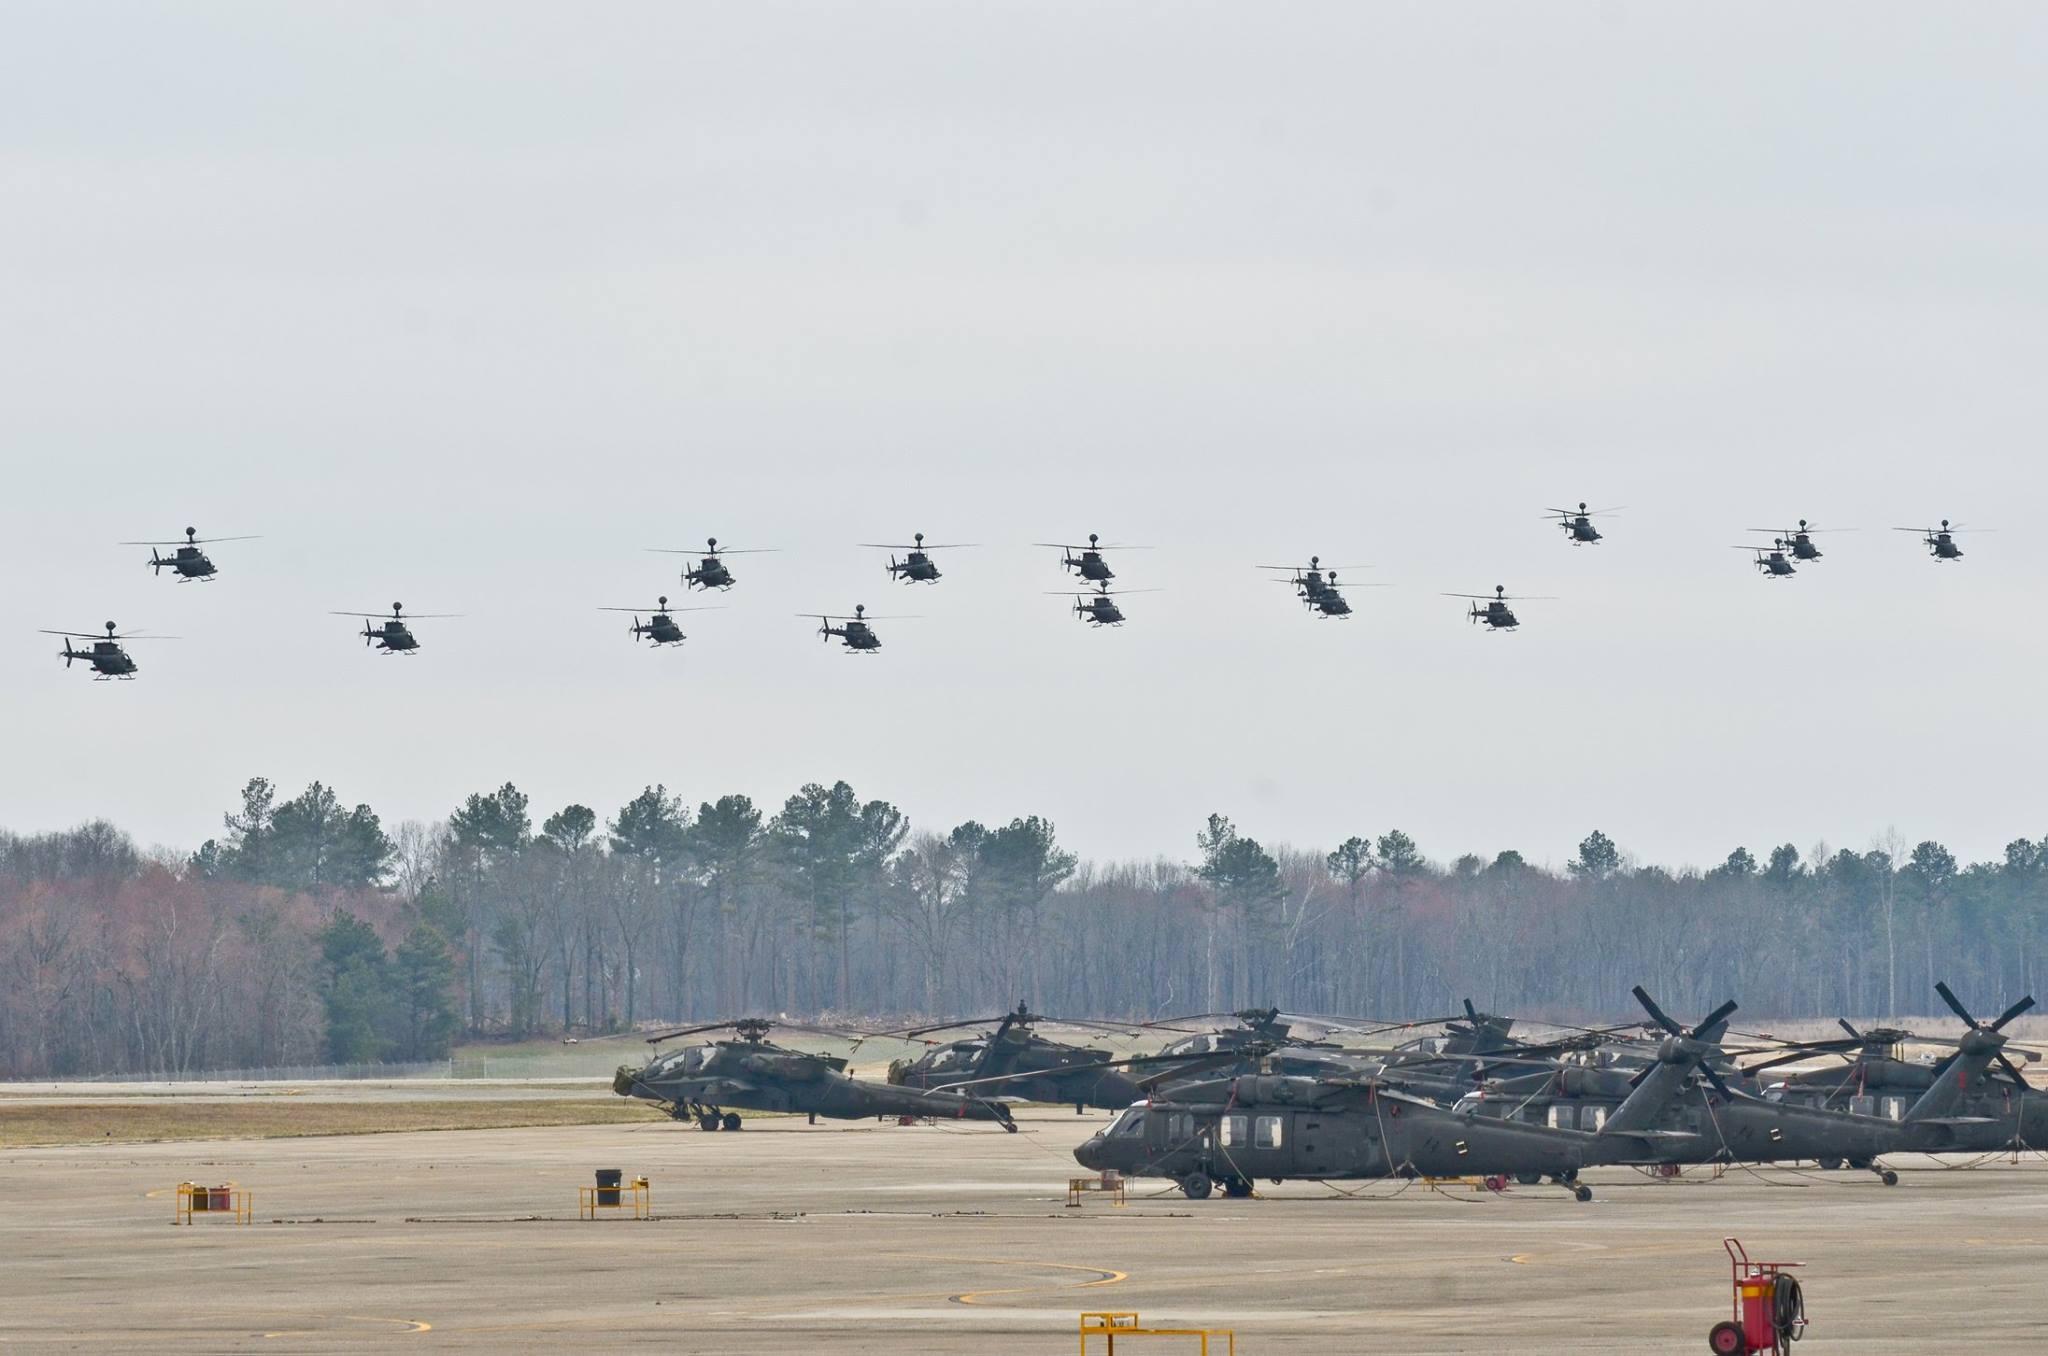 U.S. Army Using IBM Hybrid Cloud For Logistics Systems